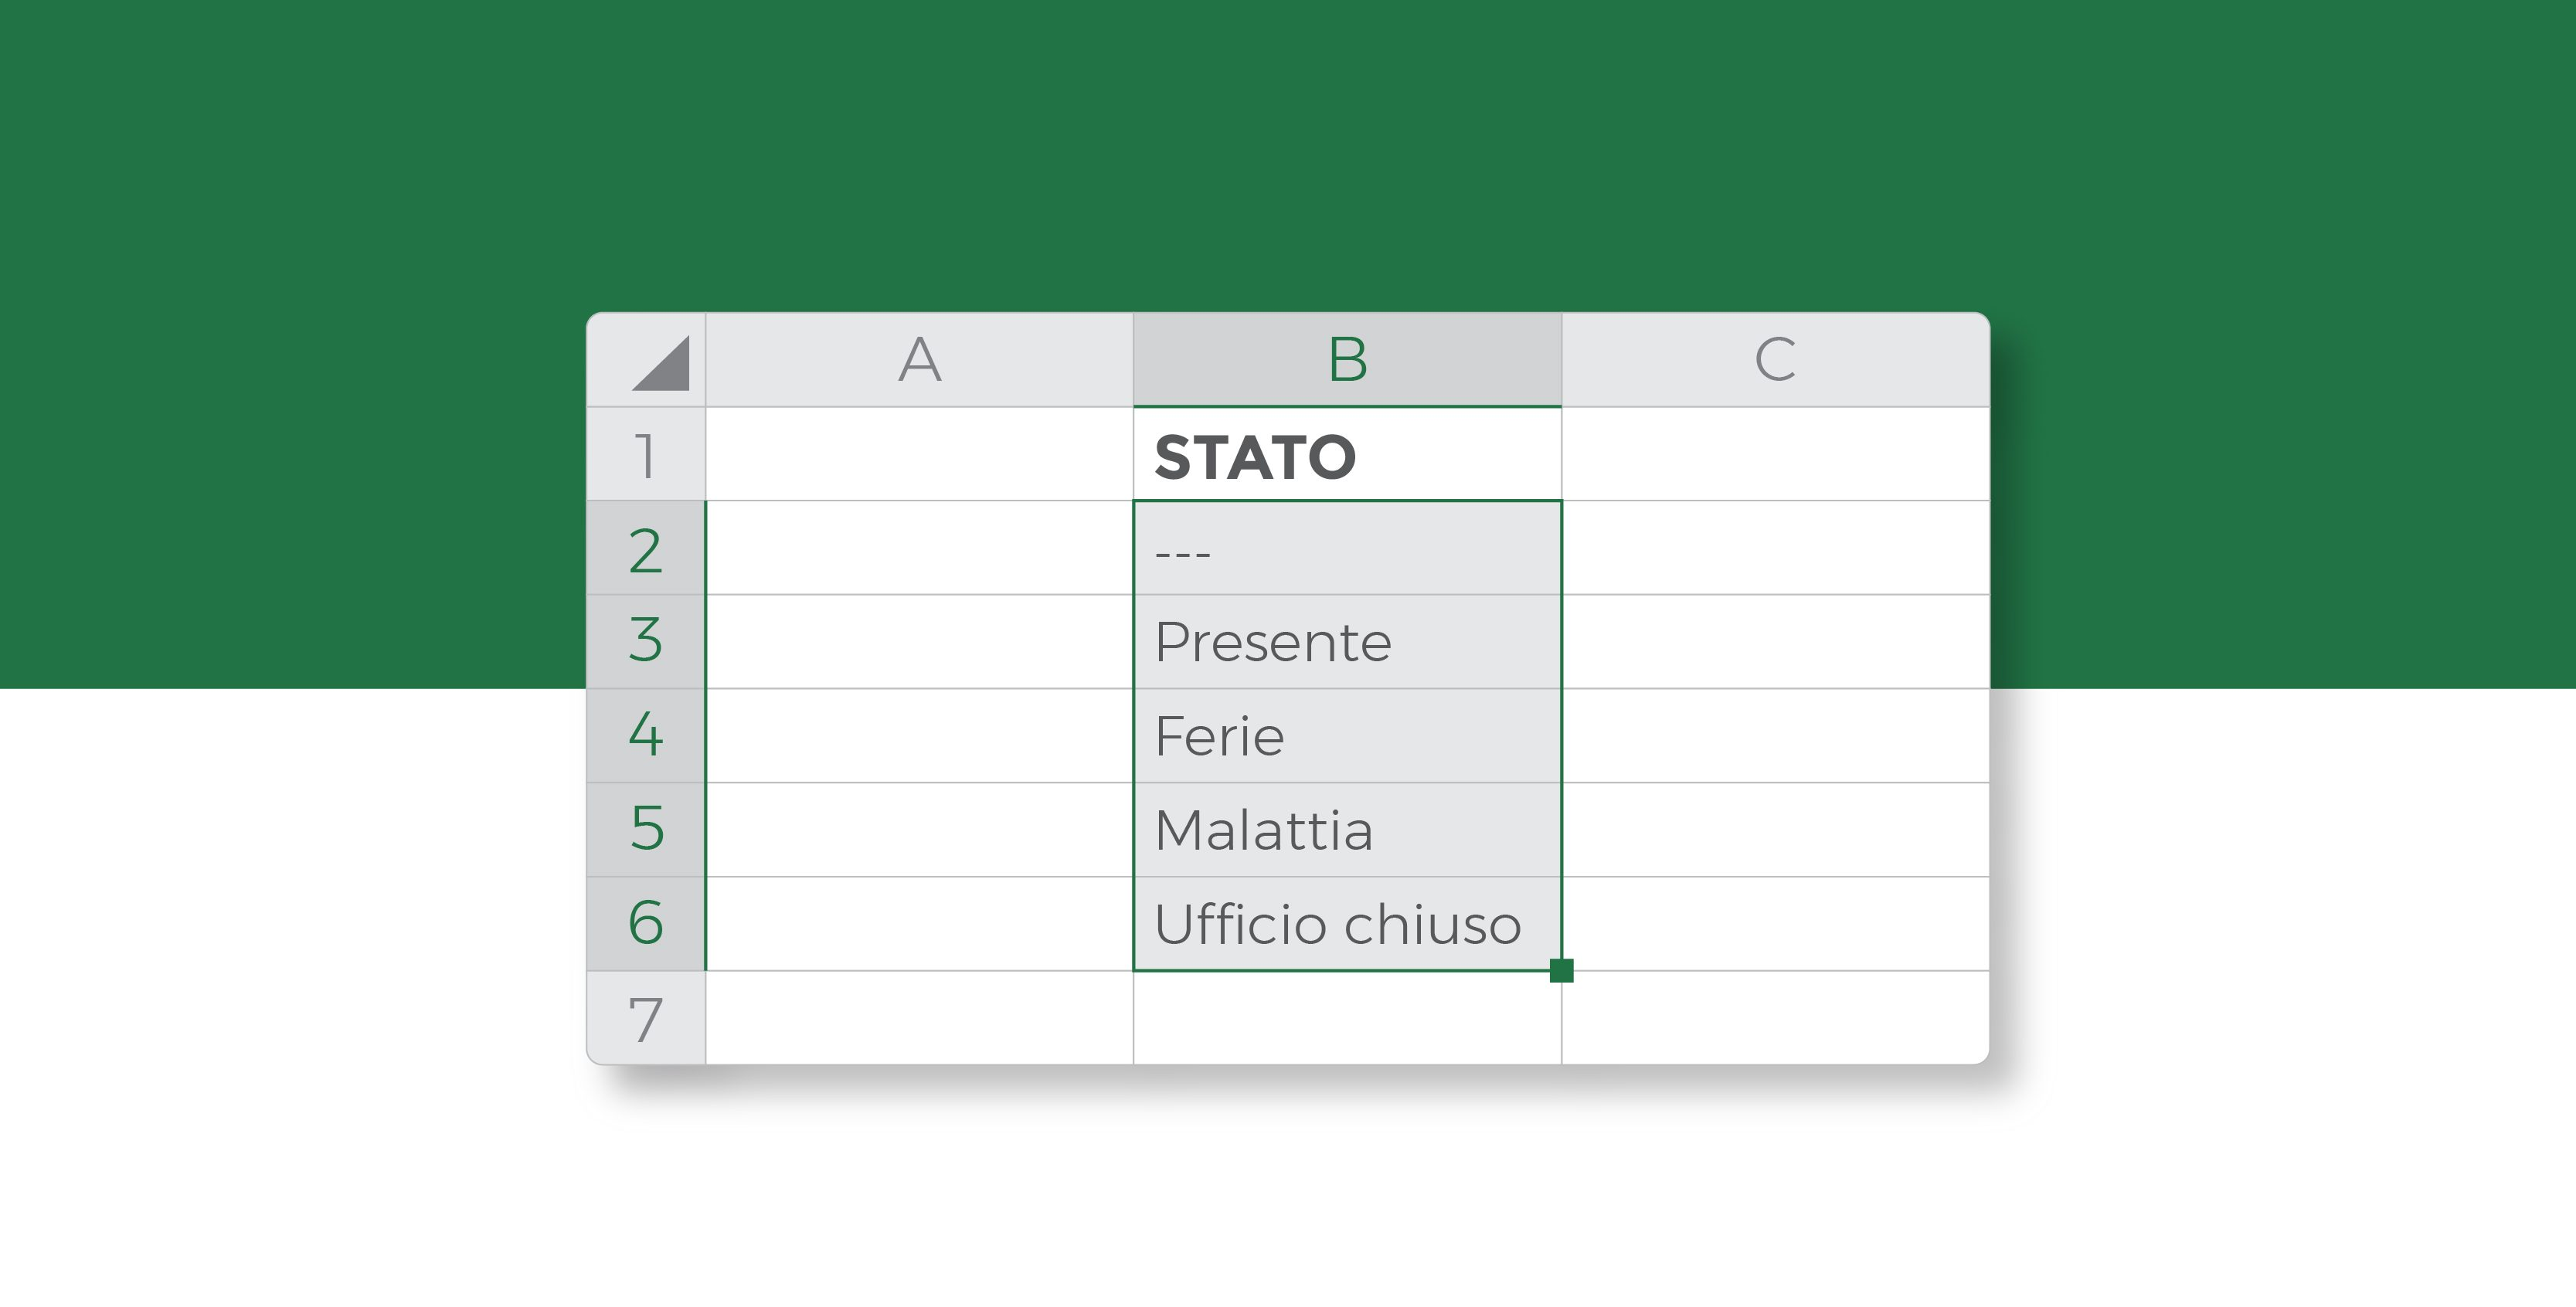 Inserire Calendario In Excel Menu A Tendina.Creare Un Menu A Tendina Con Microsoft Excel Sin Tesi Forma